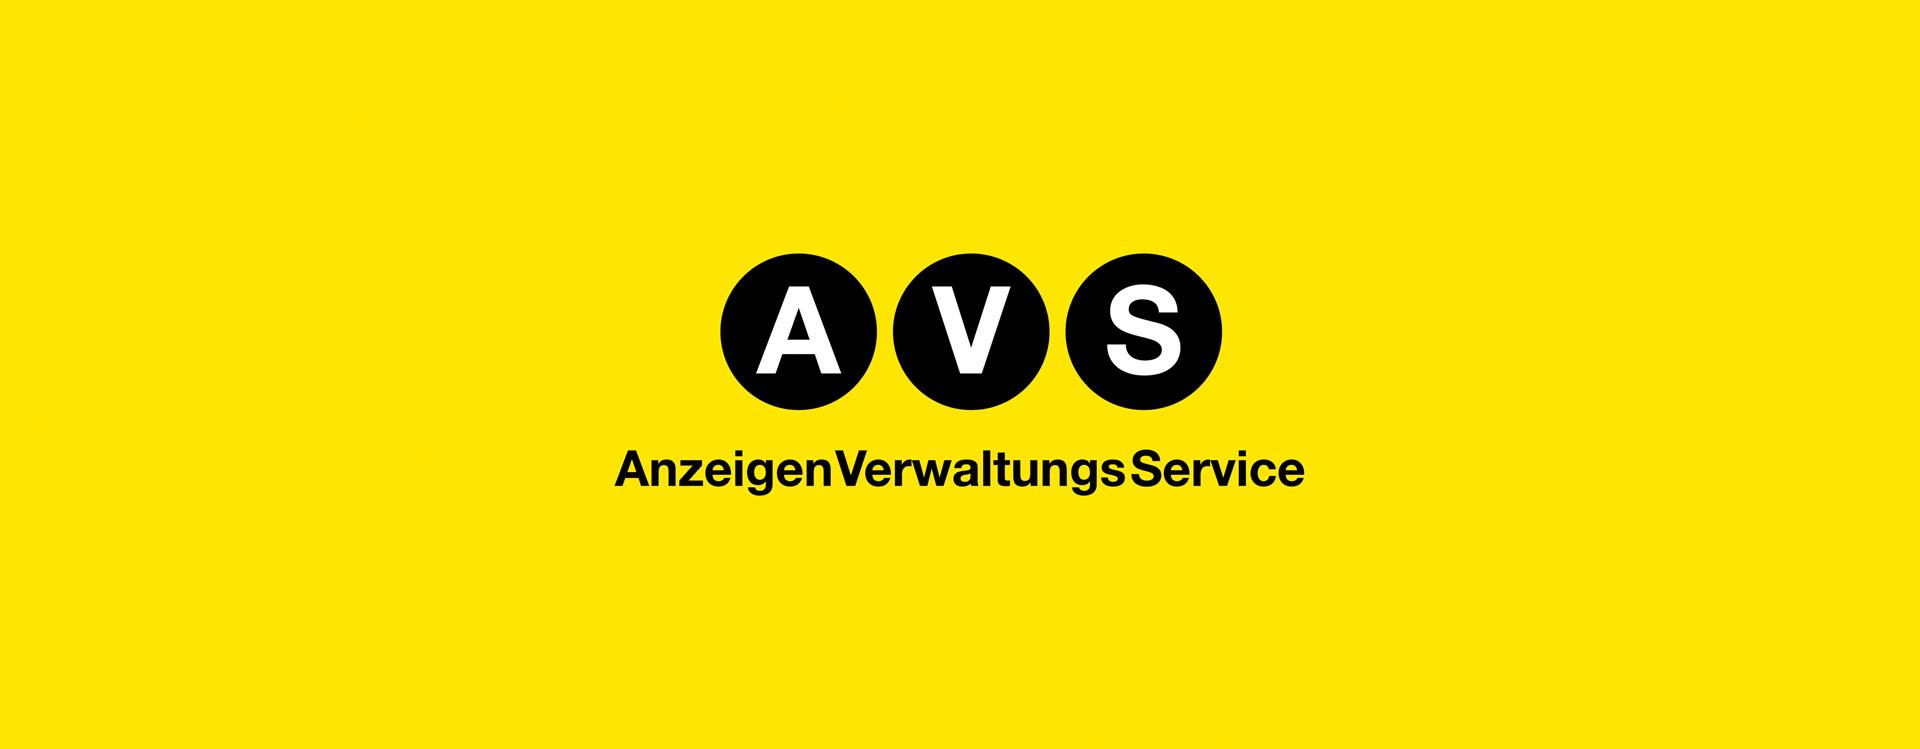 pharma werbung wegener avs anzeigen verwaltungs service info-avs.de